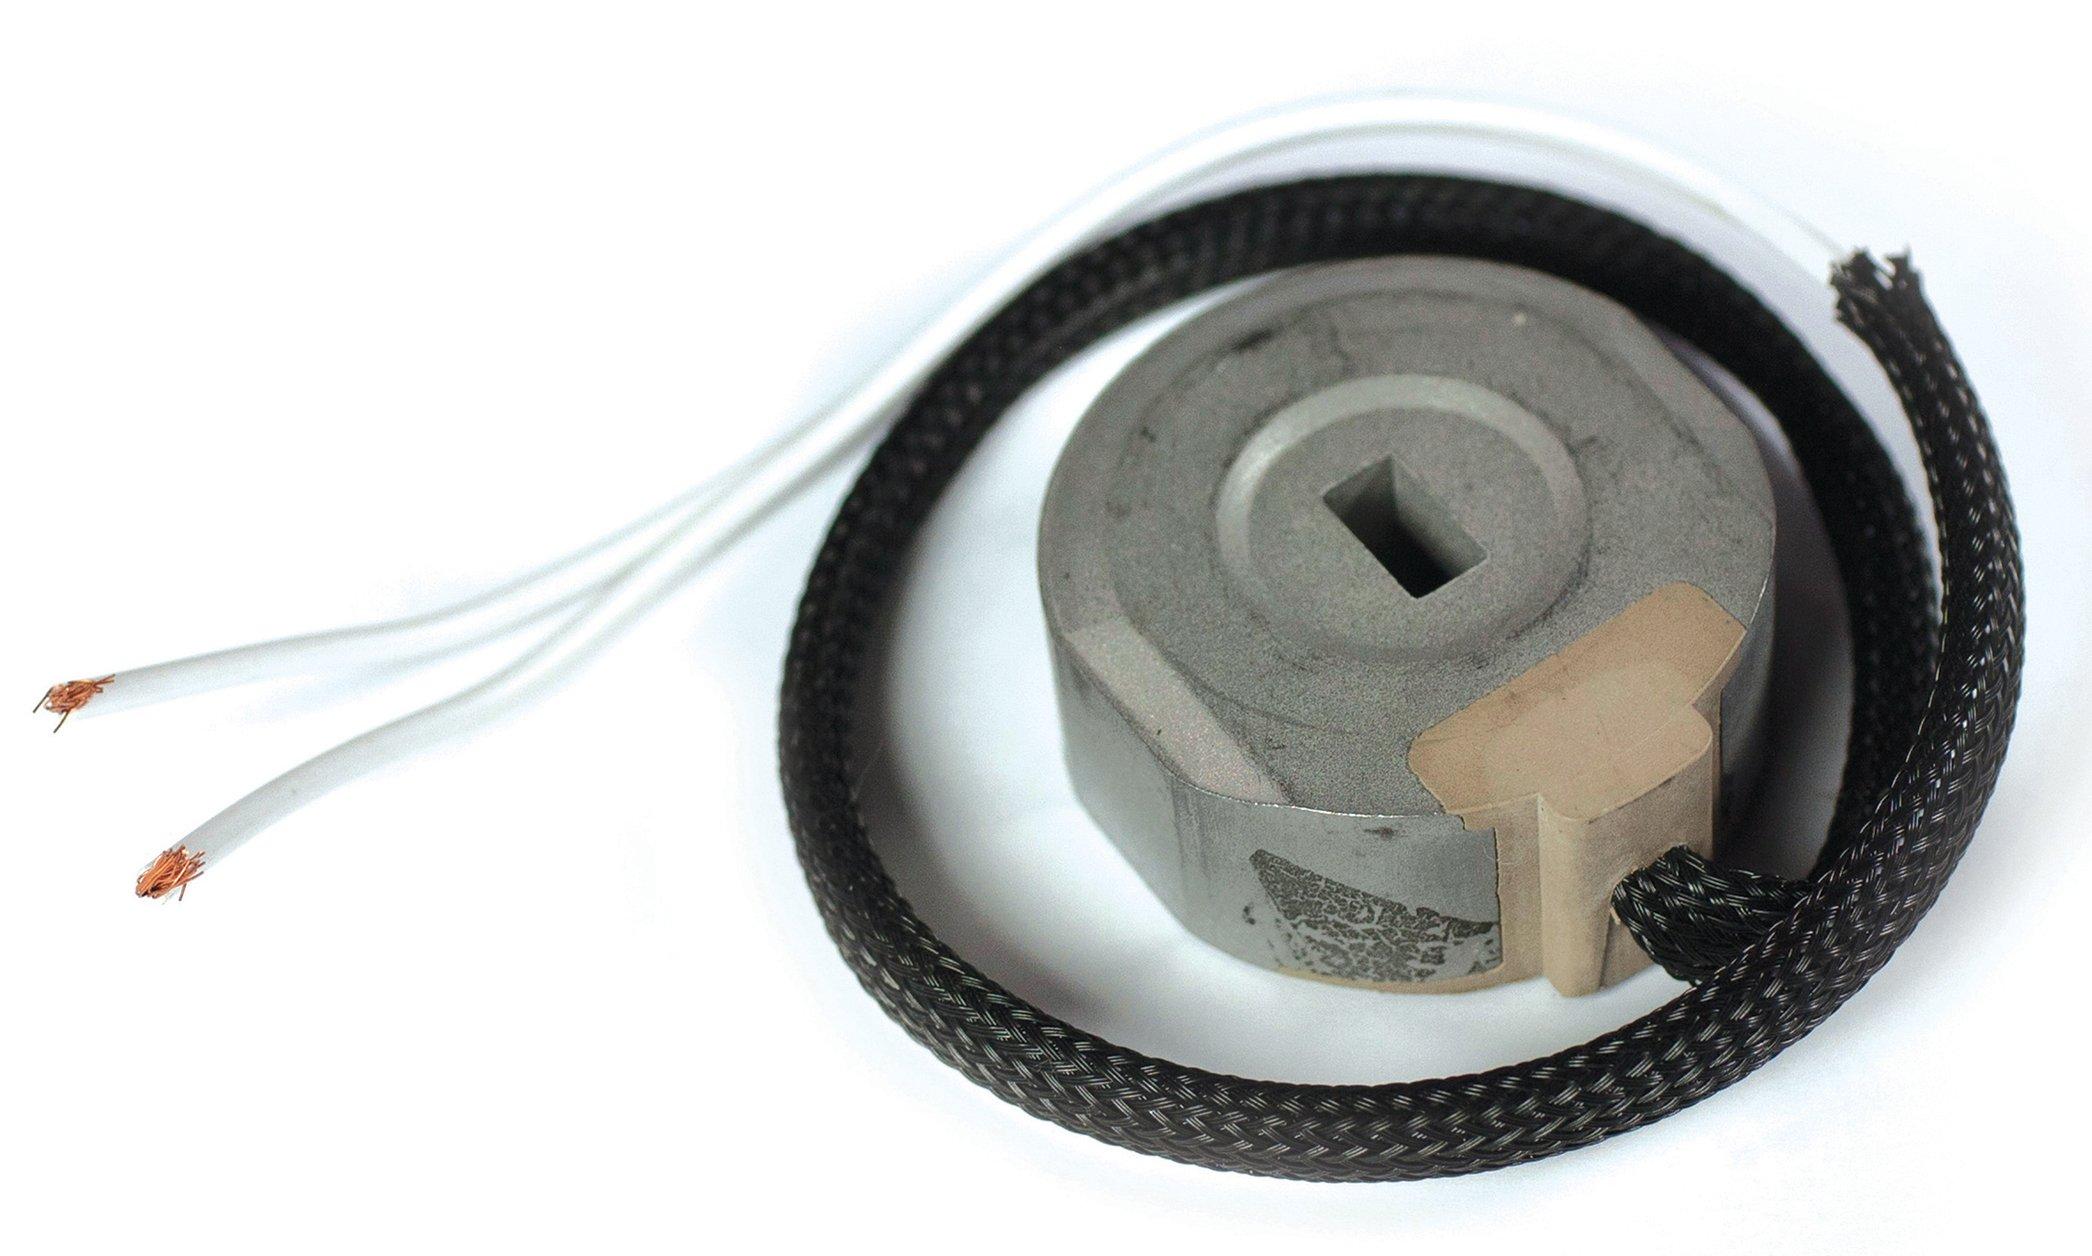 Husky 30817 7'' x 1.25'' Electric Brake Magnet Kit